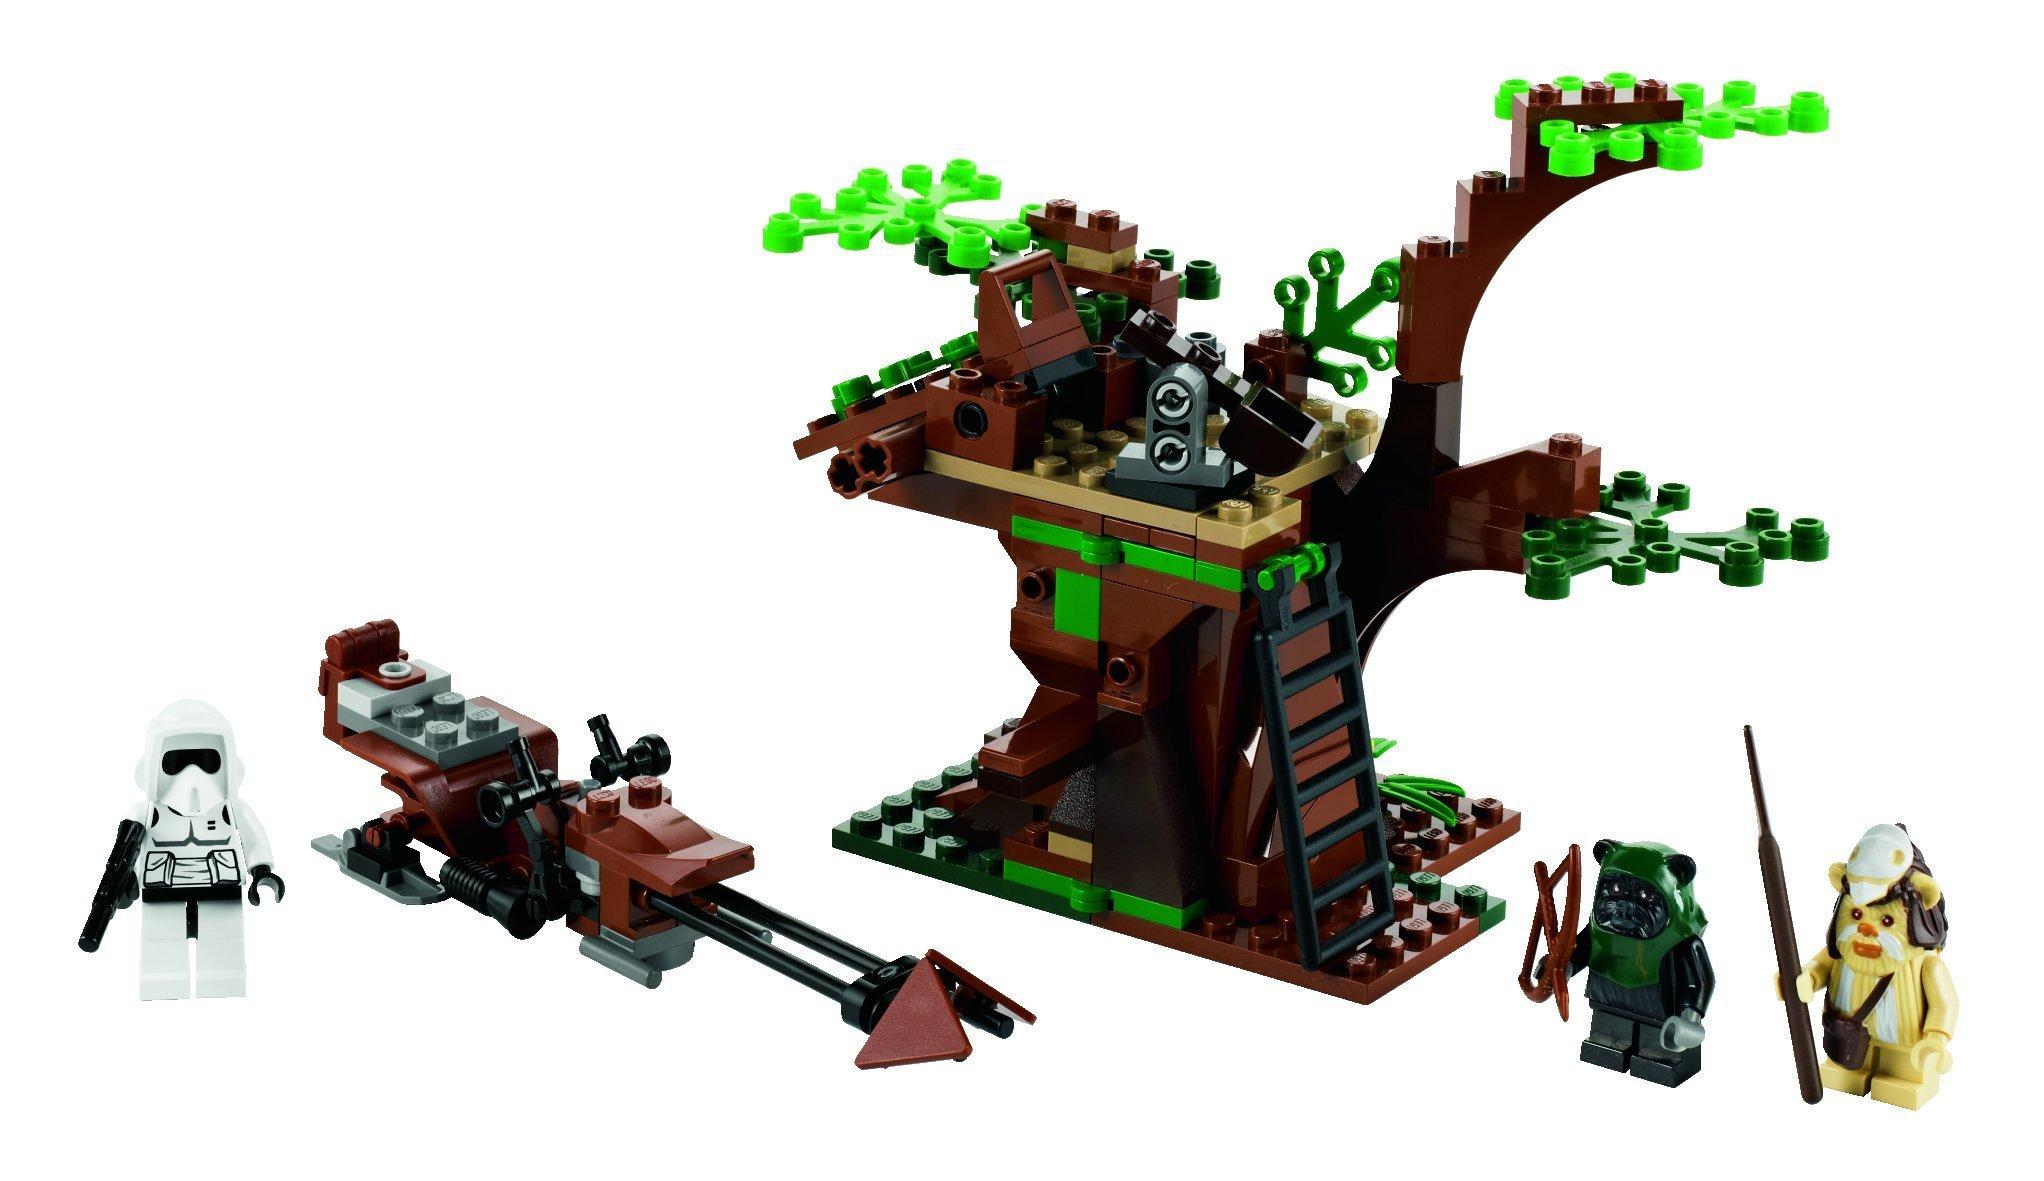 LEGO STAR WARS 7956 - The Endor Battle Pack: LEGO: Amazon.es ...